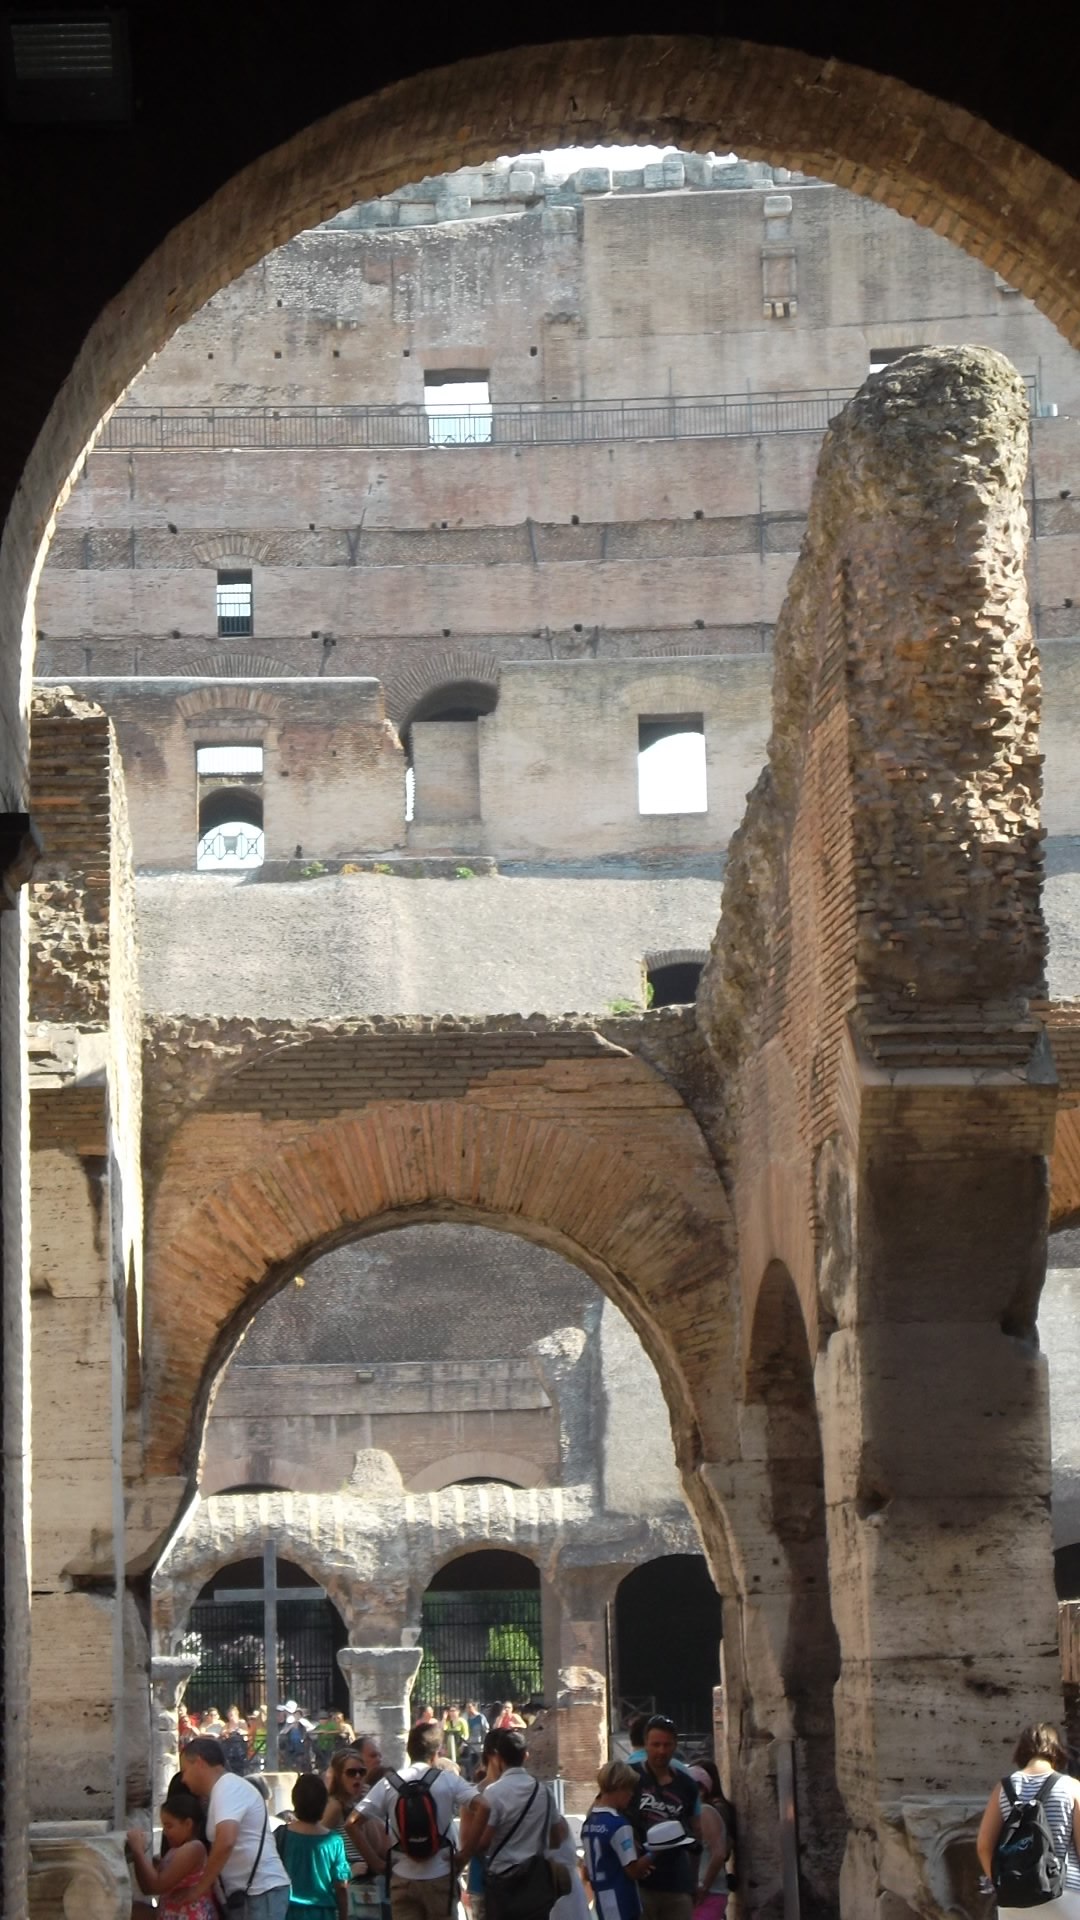 roma-colosseo-entr-side-aug13